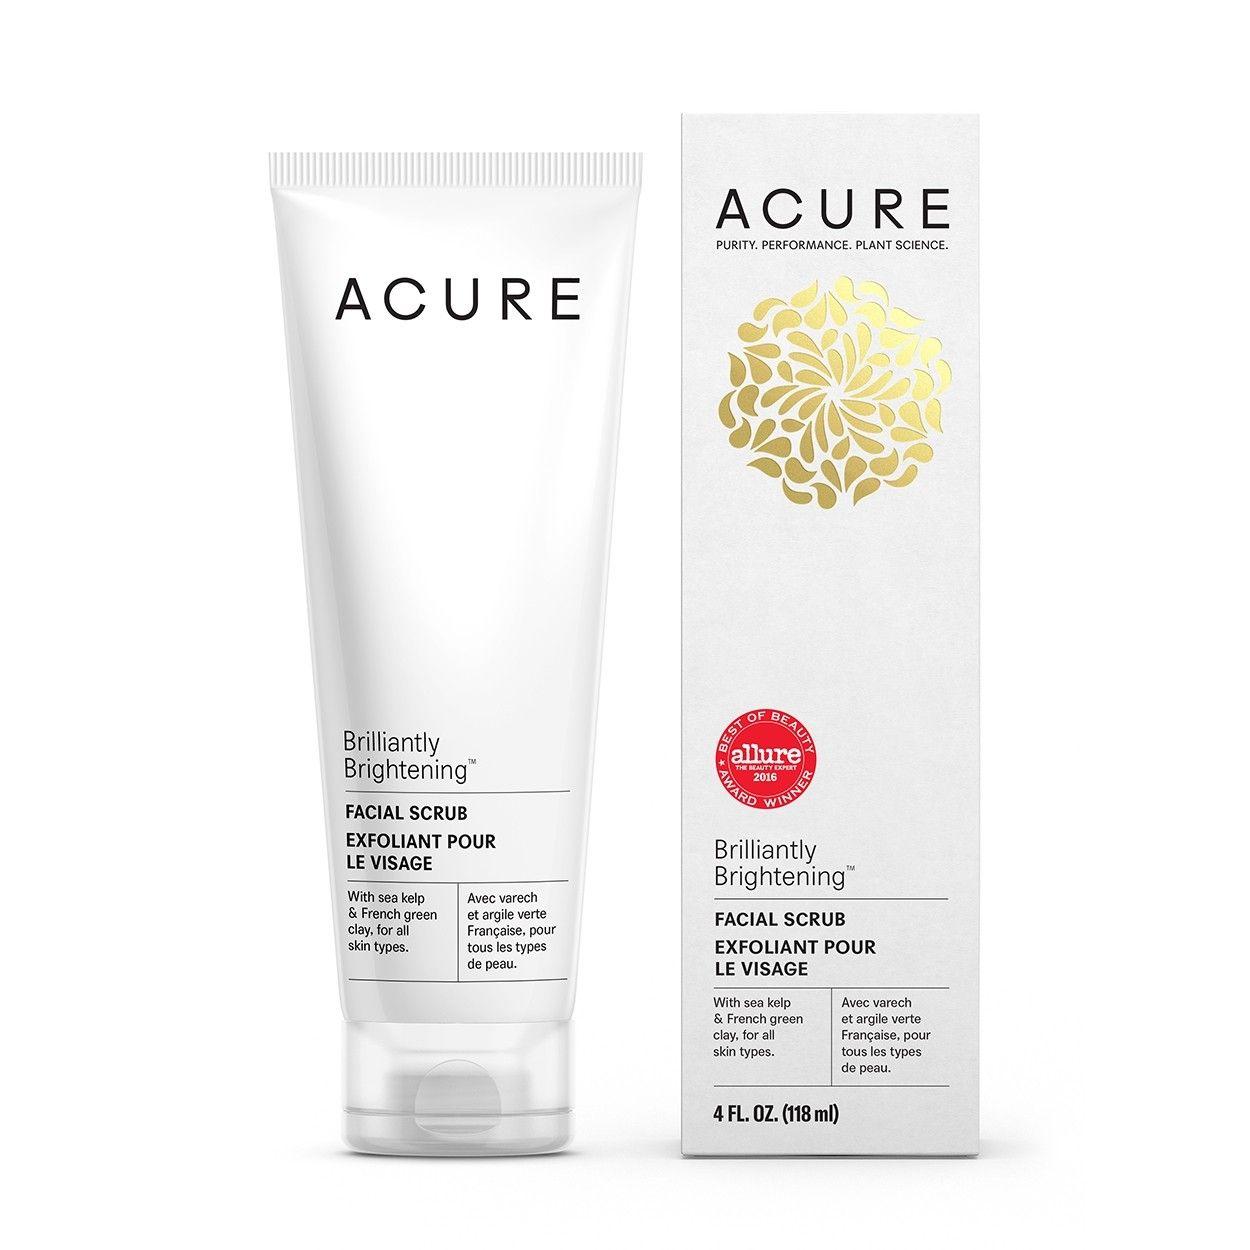 Acure Brilliantly Brightening Facial Scrub 4oz